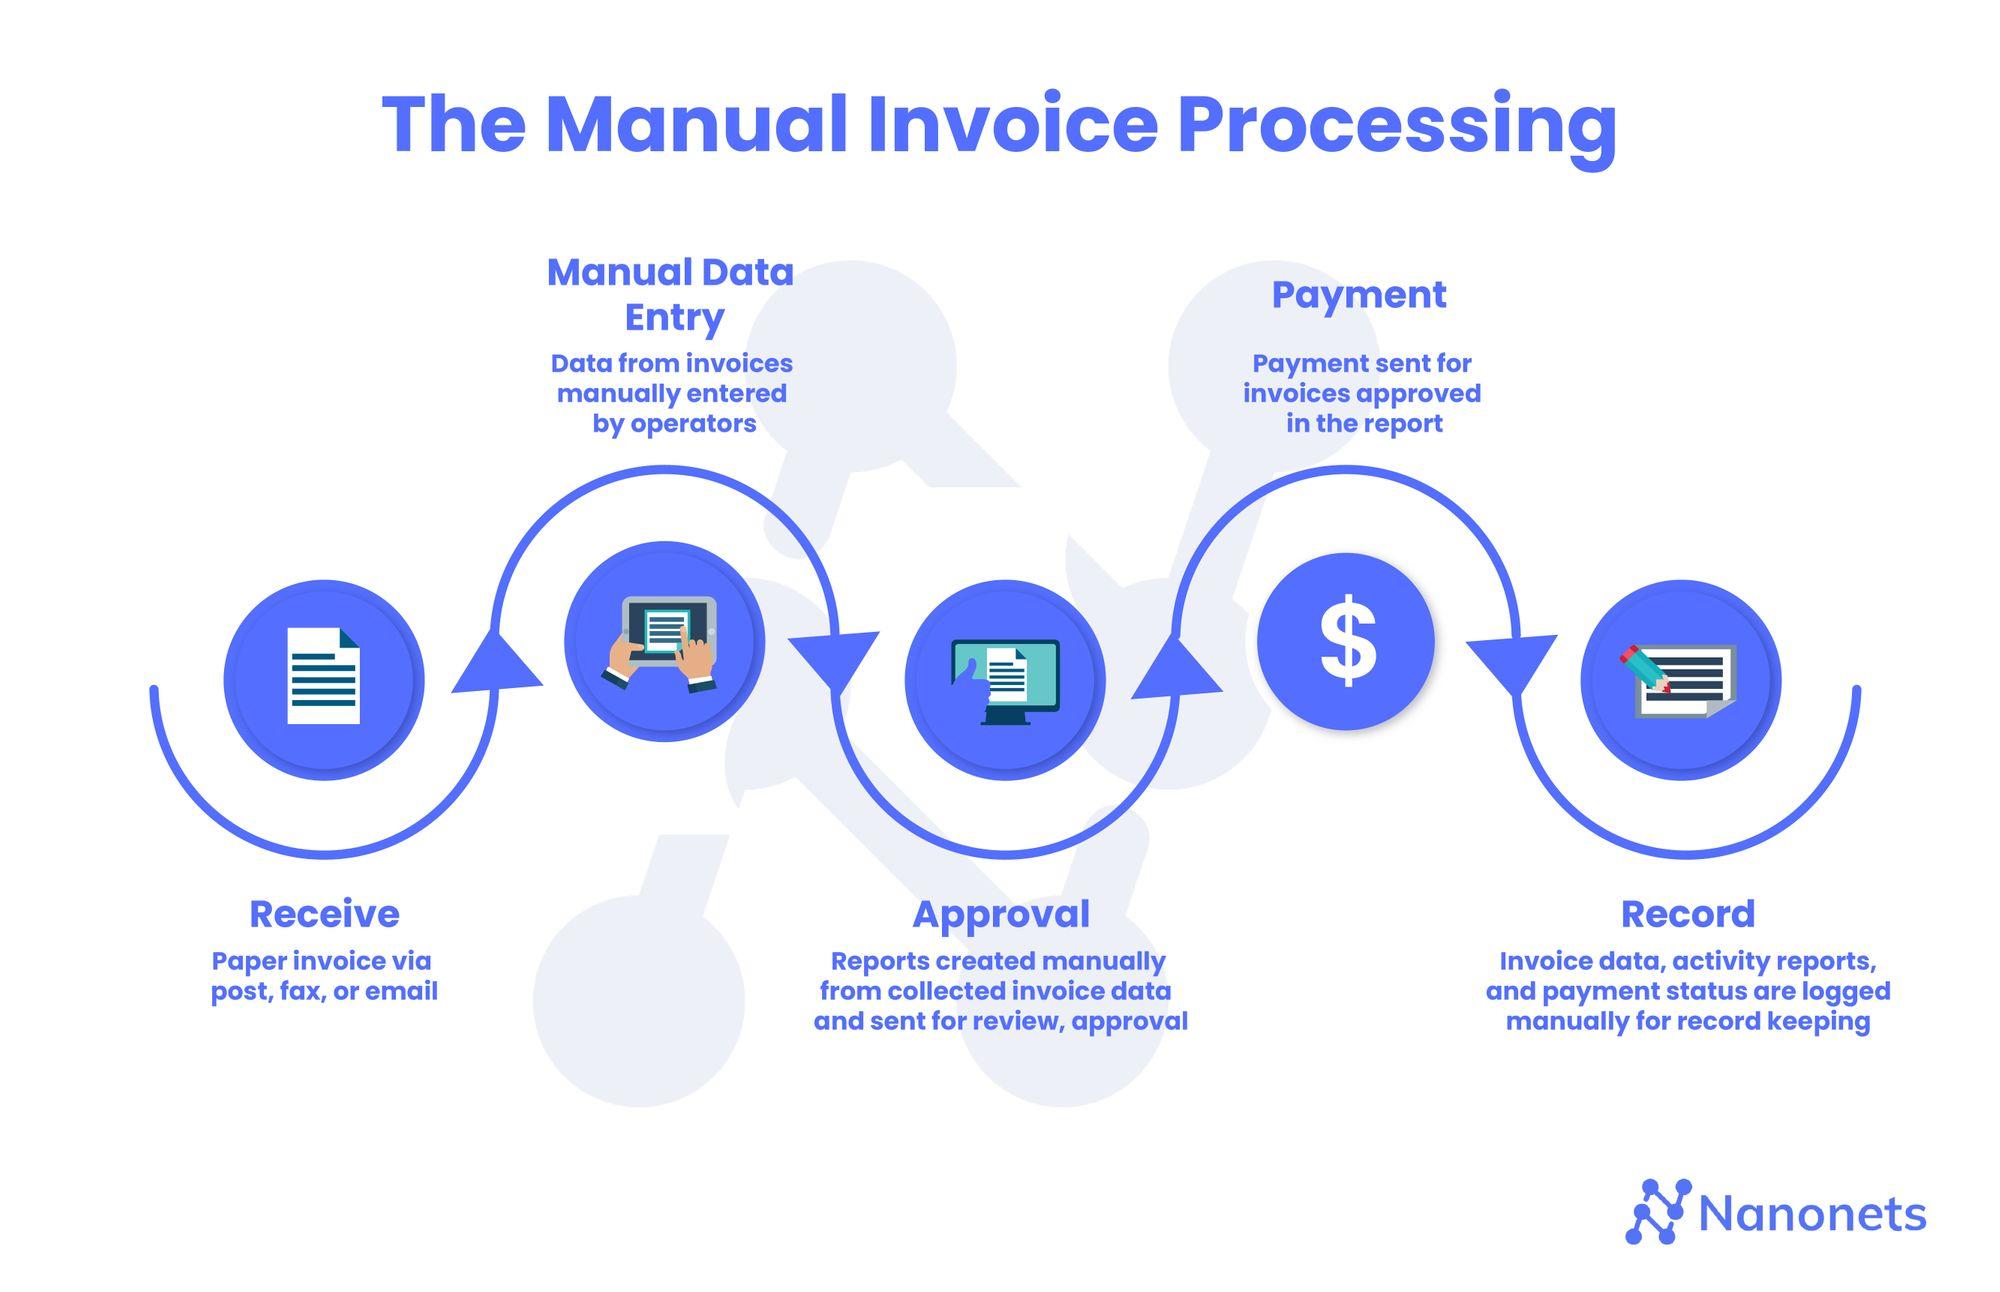 Manual Invoice Processing